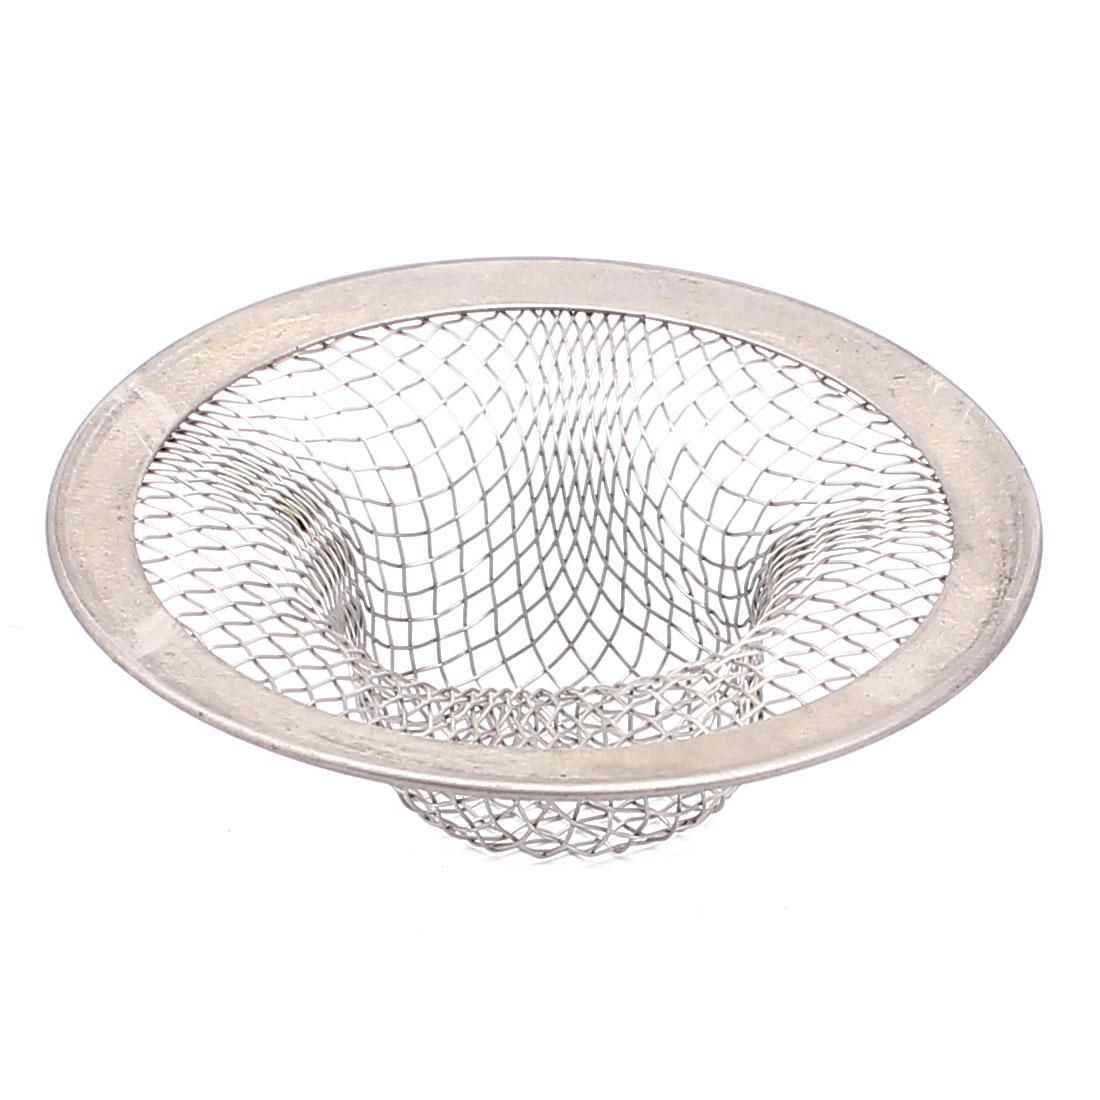 Bath Basin Sink Strainer Filter Sieve Drain Net Silver Tone 45mm Mesh Basket Dia